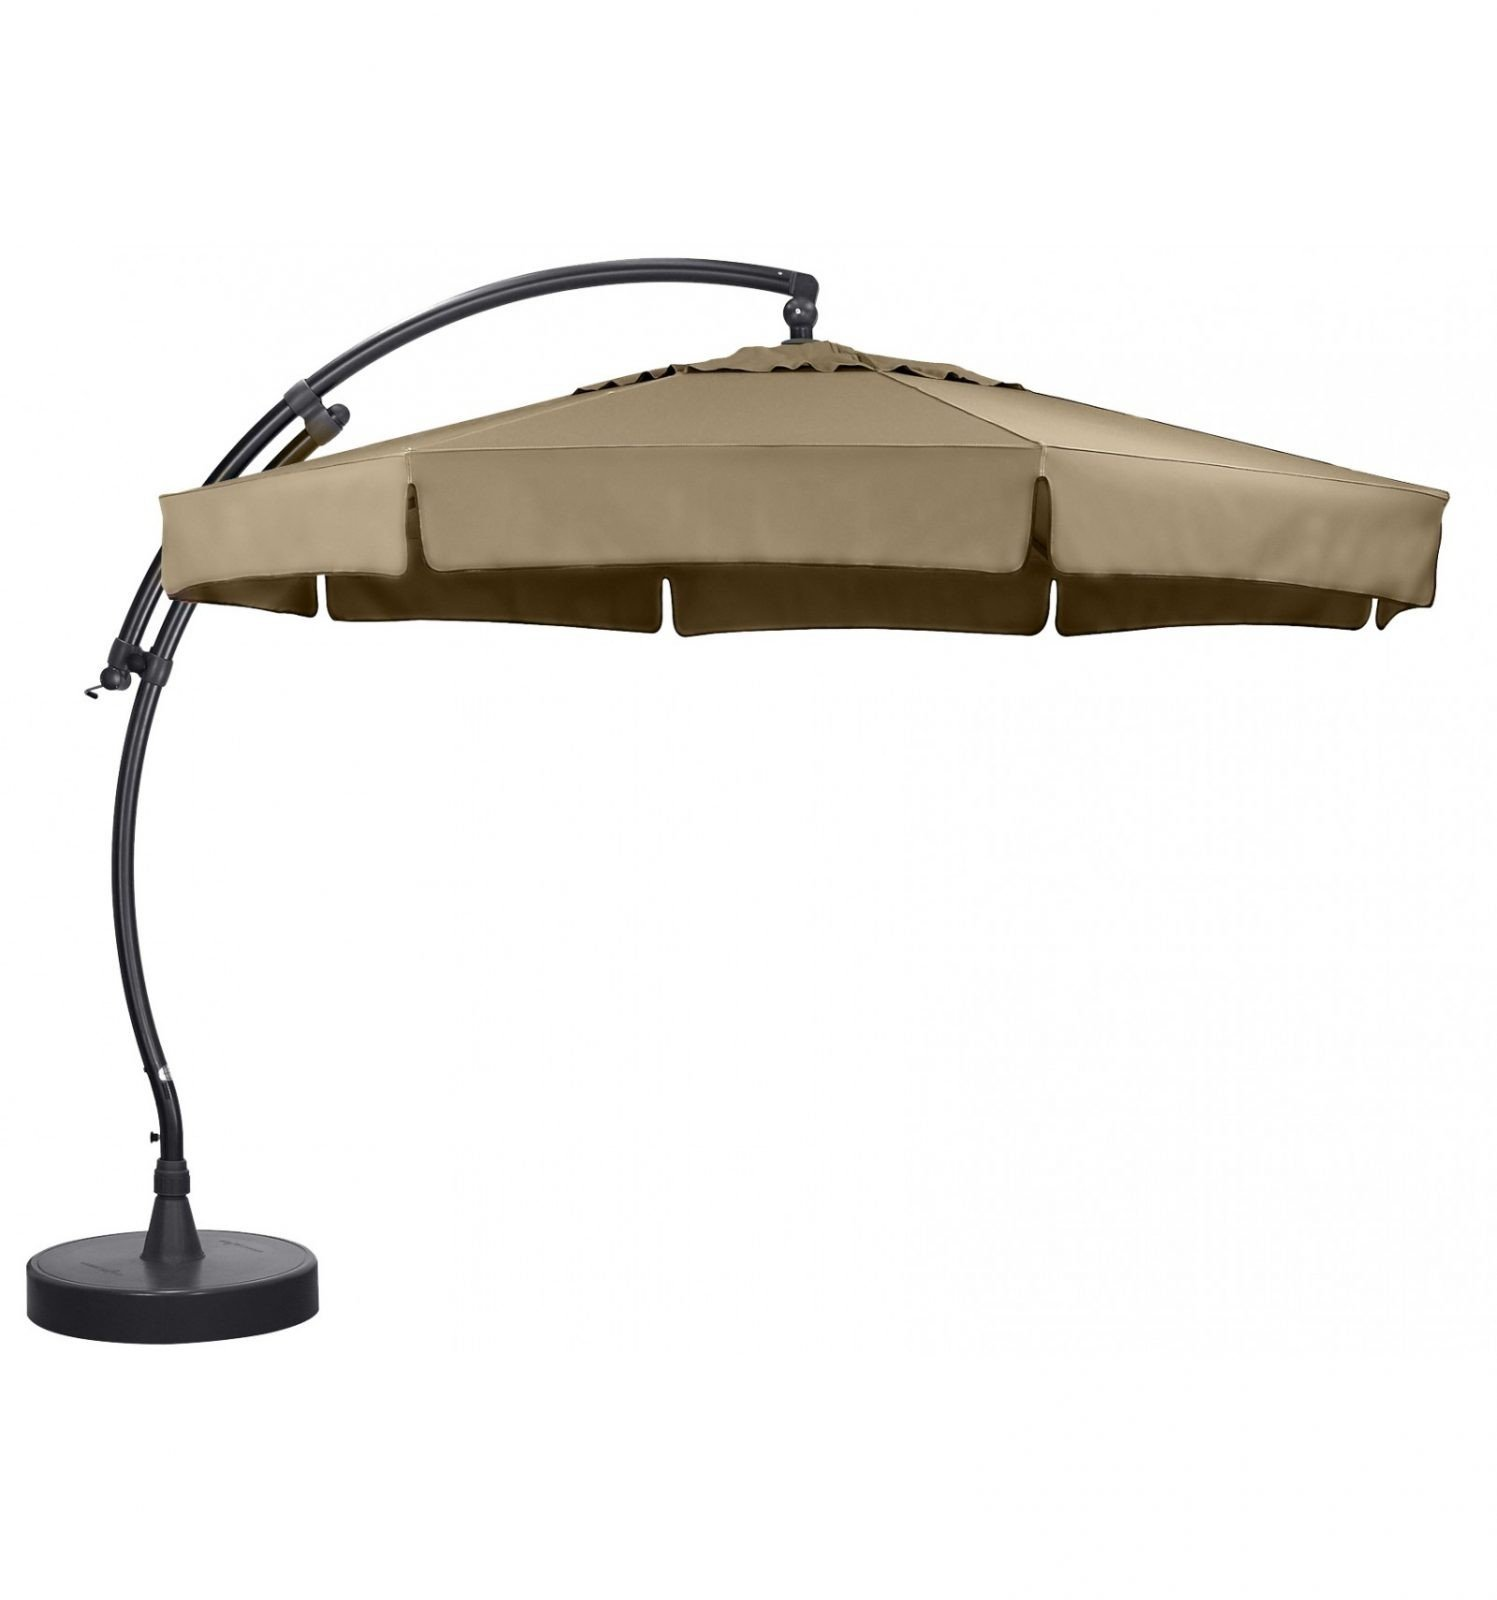 easy sun parasol kd 350cm klassiek. Black Bedroom Furniture Sets. Home Design Ideas